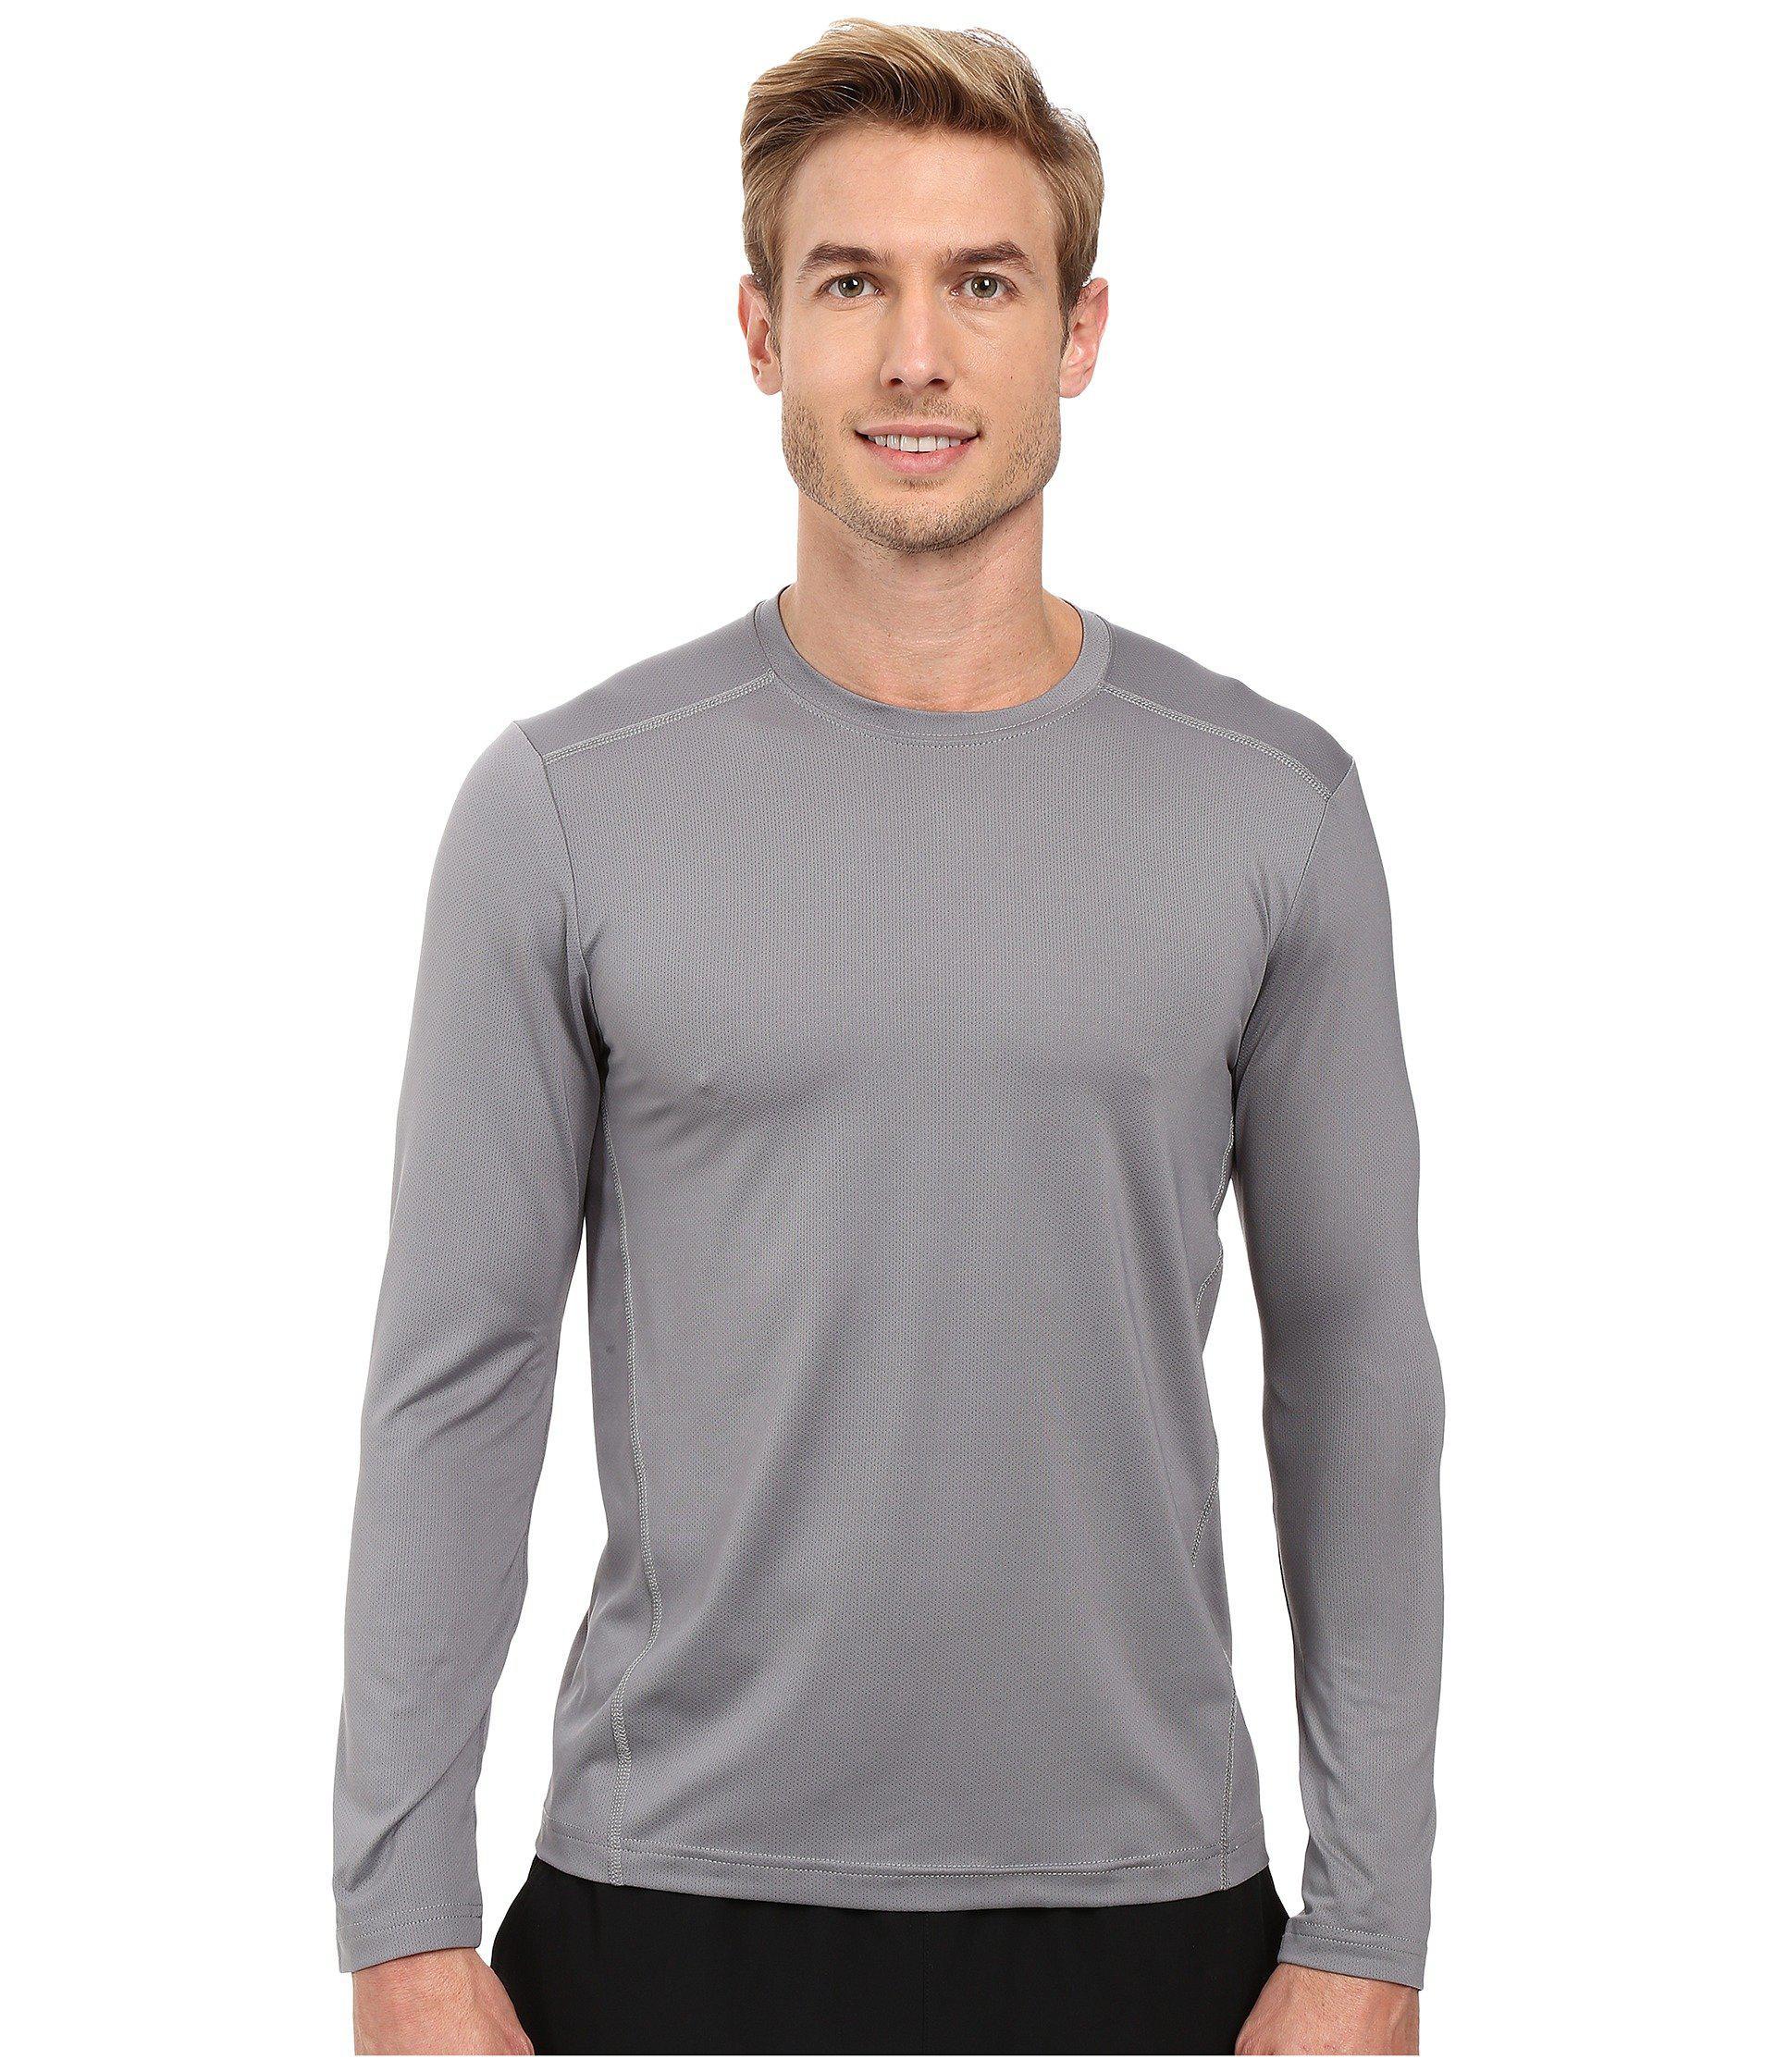 Lyst Adidas Climacool Camiseta de manga larga manga individual Camiseta Adidas en gris para hombre 1effc9d - grind.website